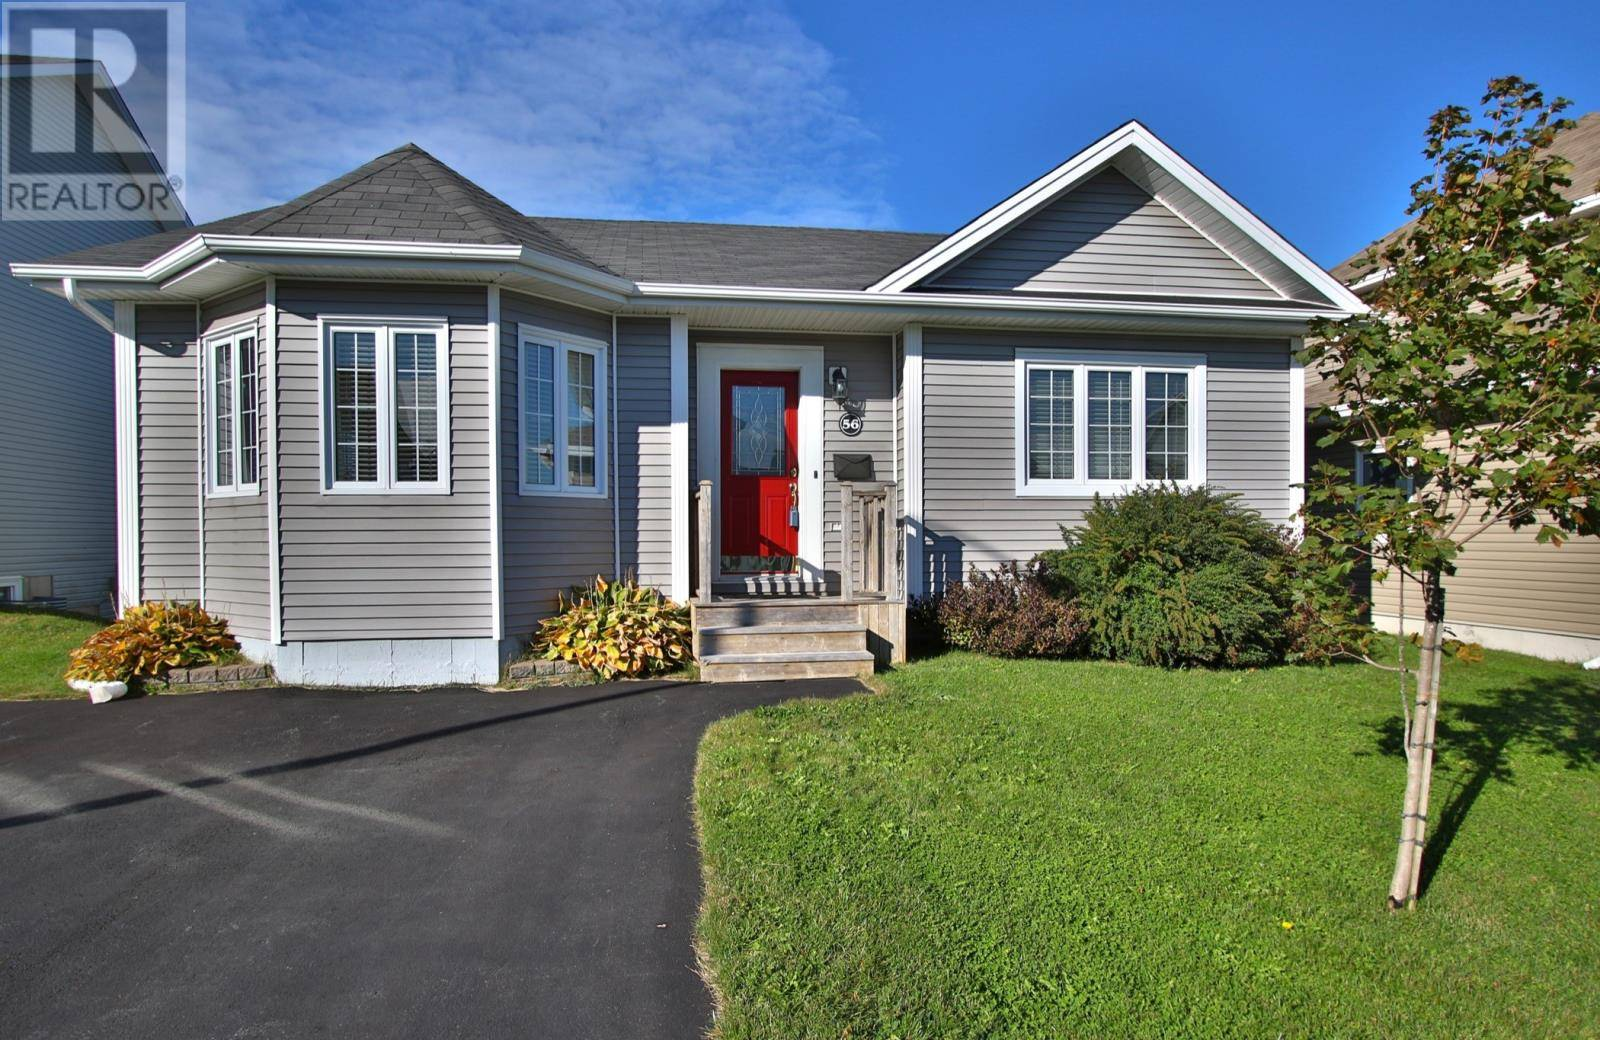 House for sale at 56 Navajo Pl St. John's Newfoundland - MLS: 1212253